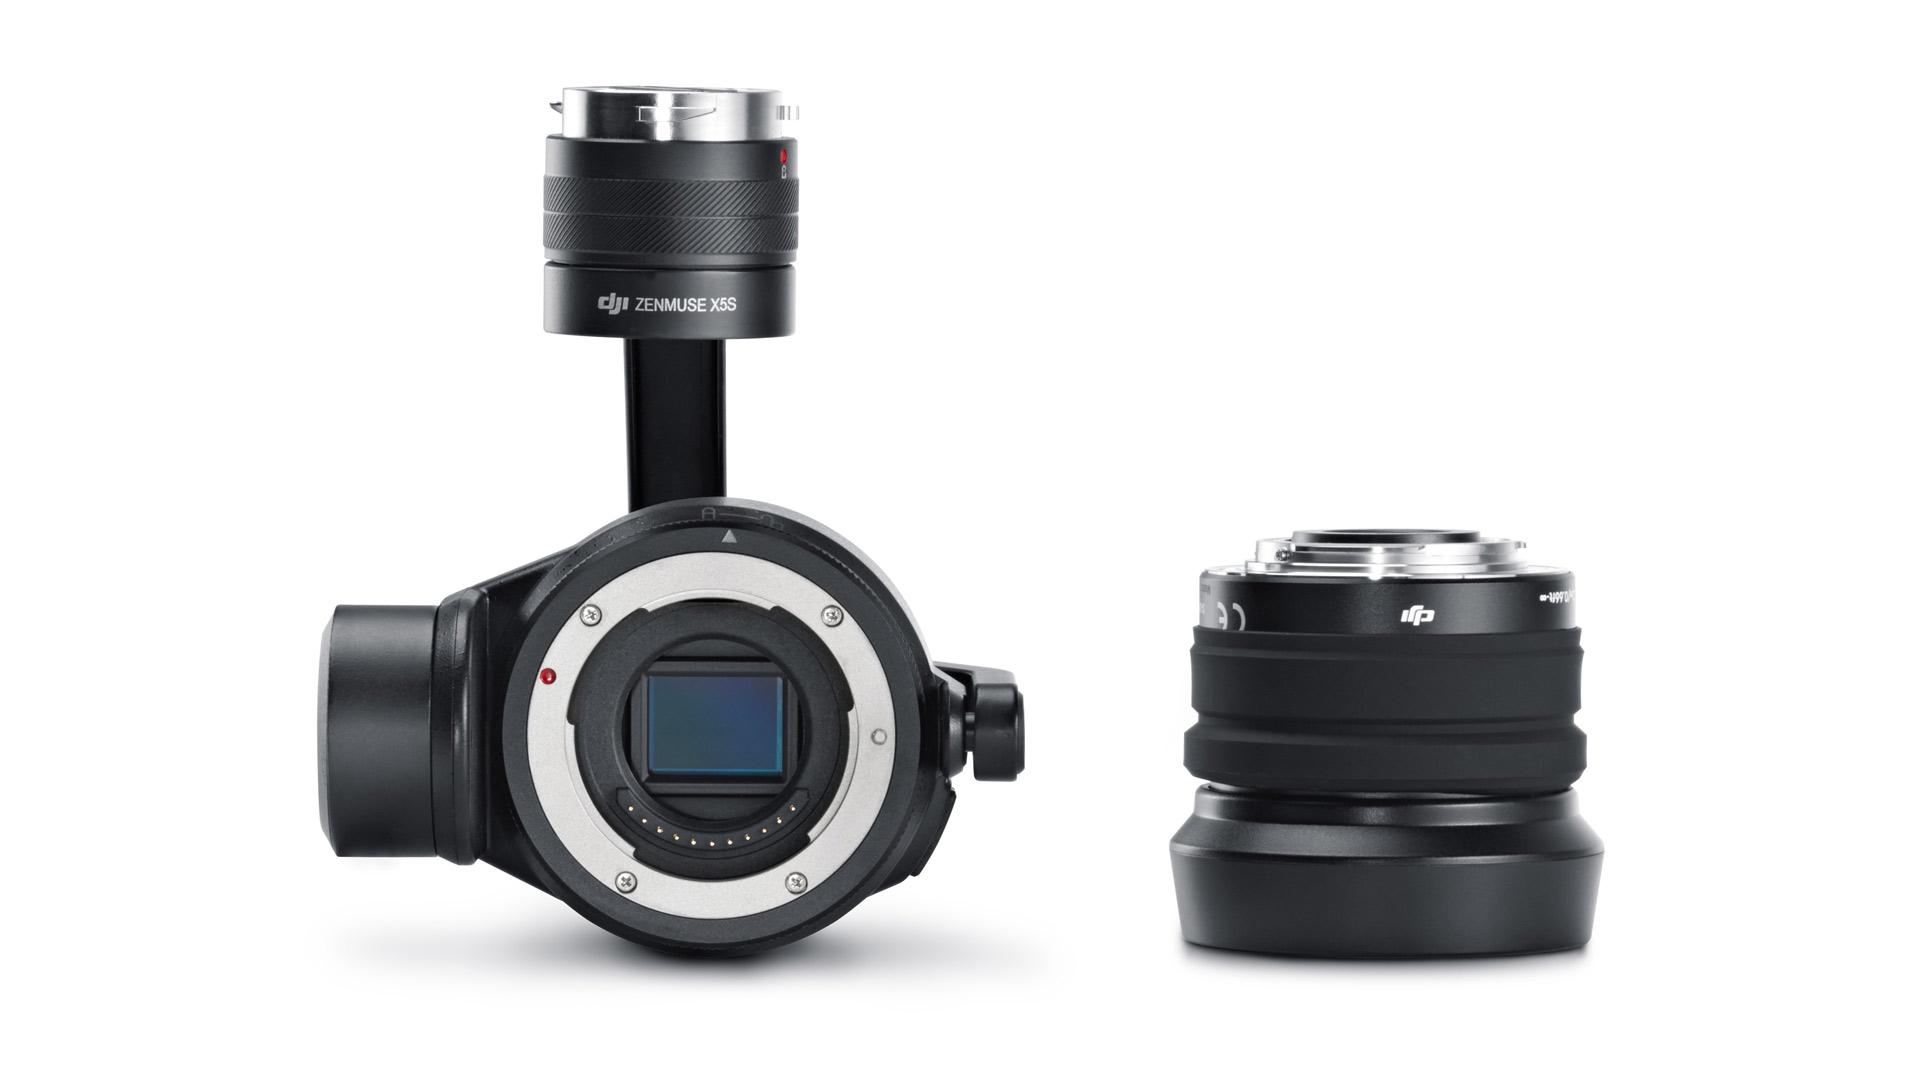 Dji Inspire 2 5k Raw The Best Camera Drone Weve Ever Seen Zenmuse X5s Mft